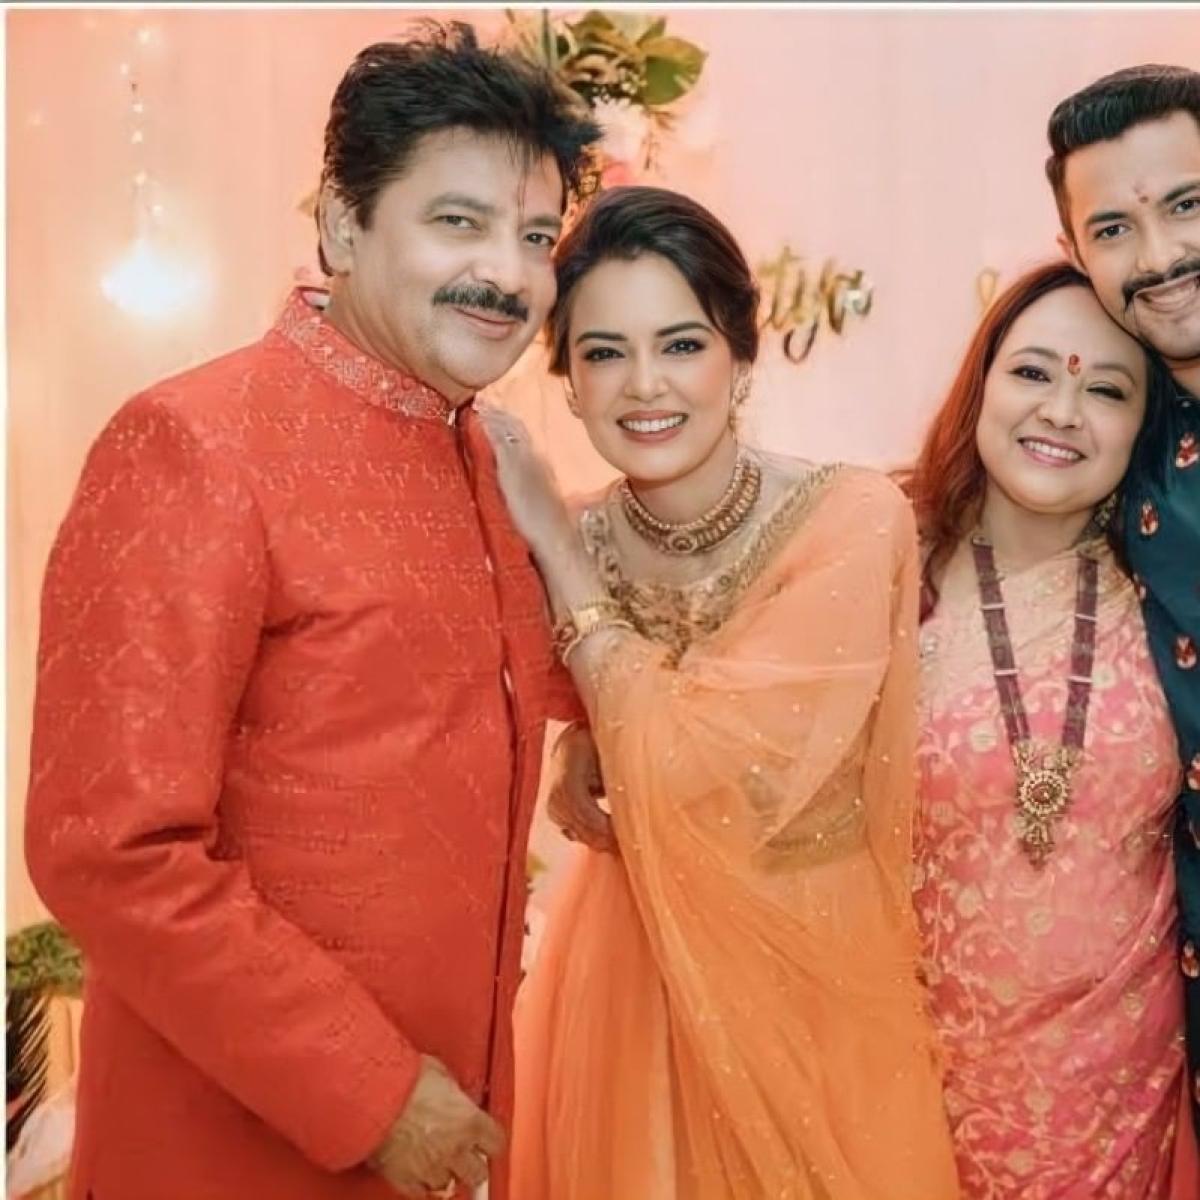 In Pics: Aditya Narayan and Shweta Agarwal kick-start wedding festivities with Tilak Ceremony